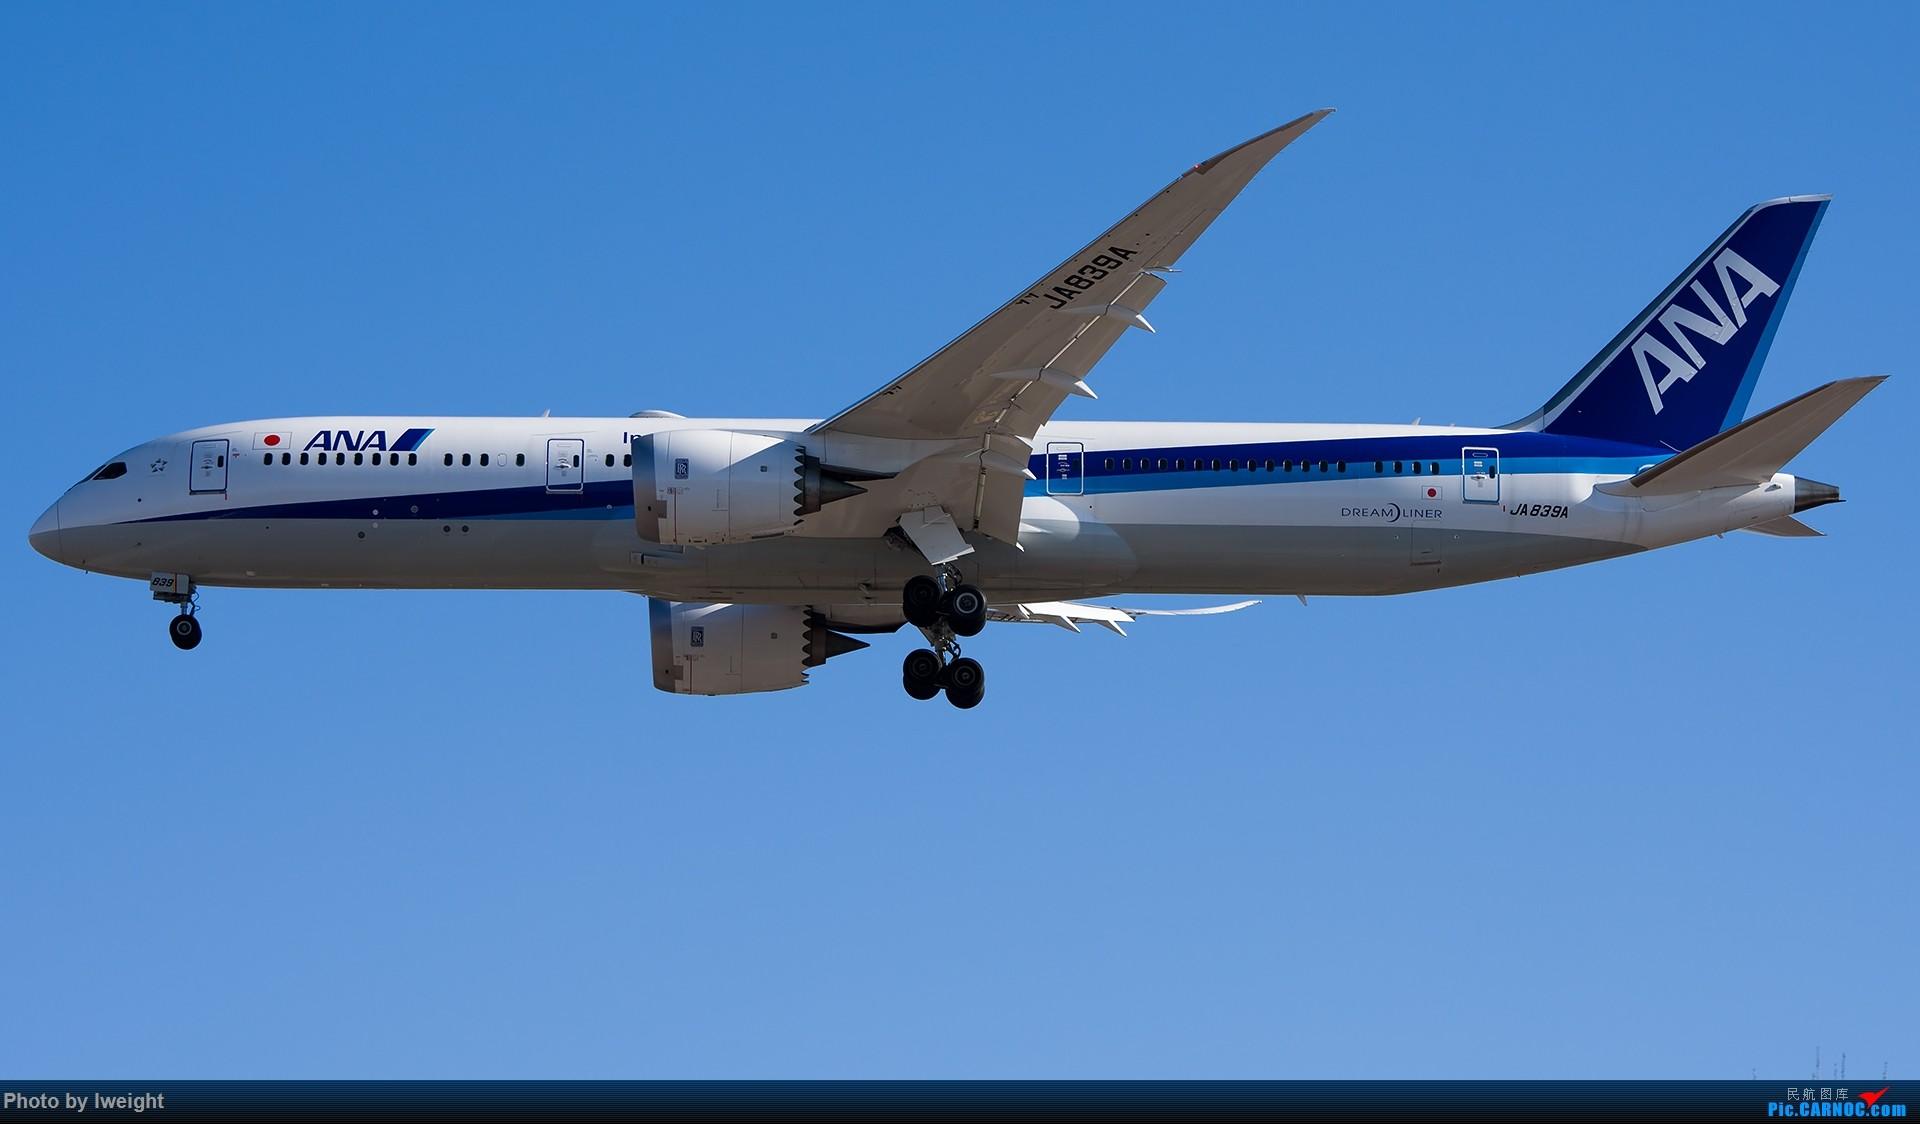 Re:[原创]又见蓝月亮 BOEING 787-9 JA839A 中国北京首都国际机场